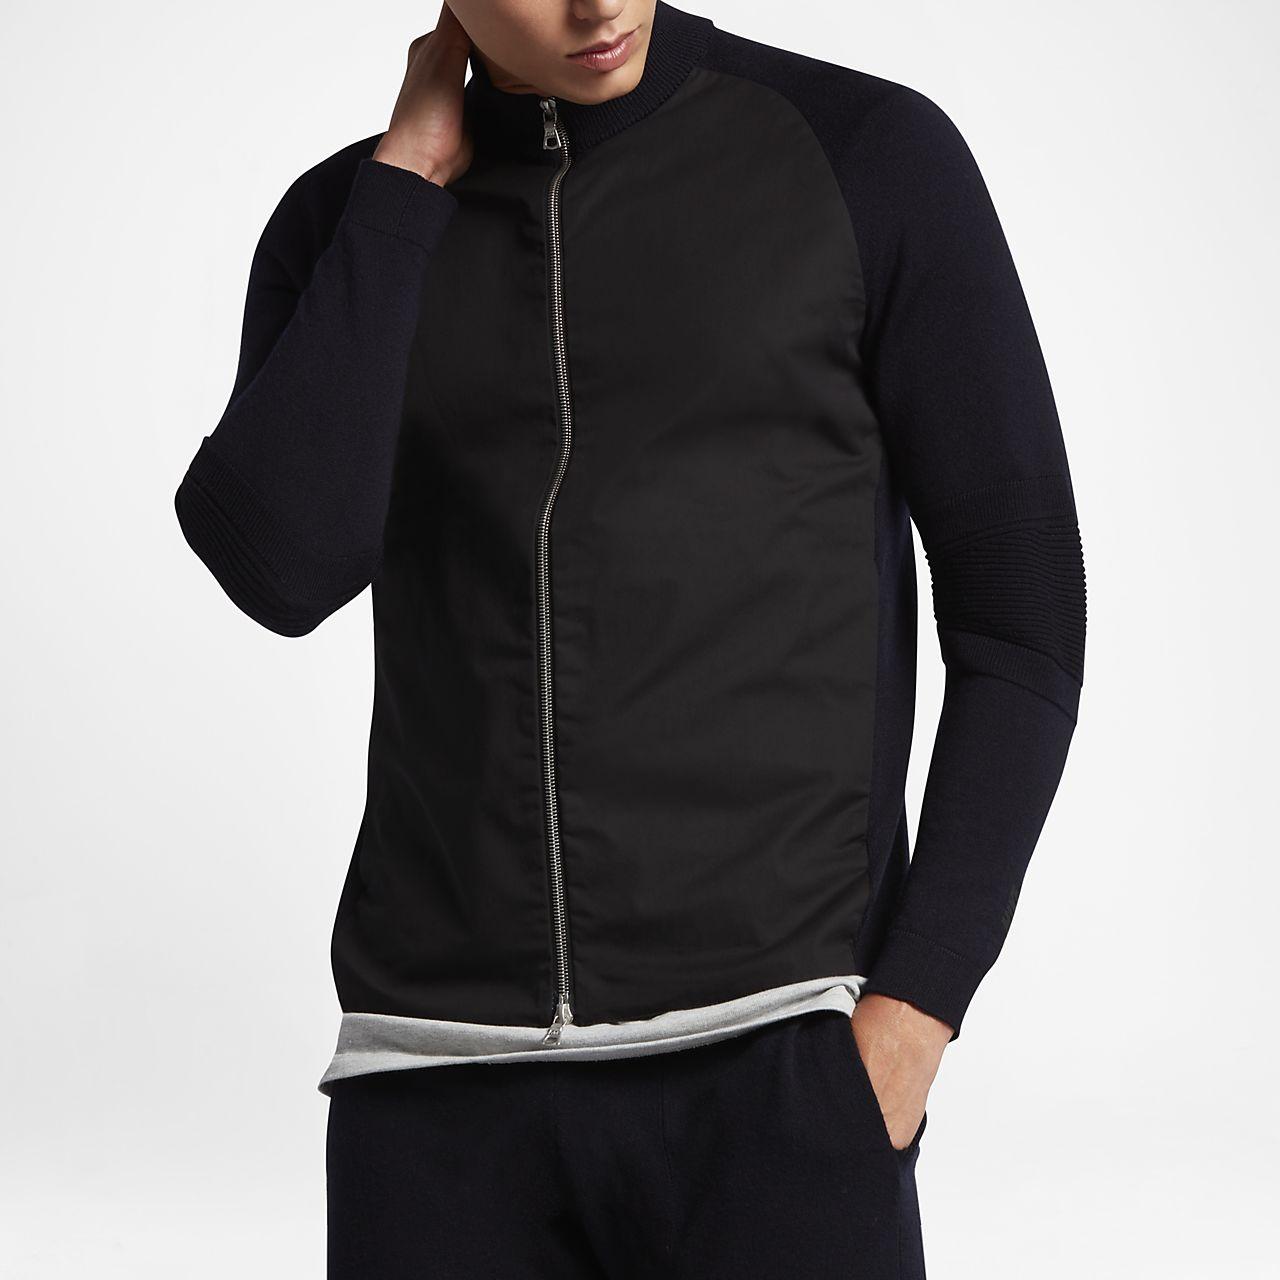 NikeLab Tech Knit N98 男子夹克